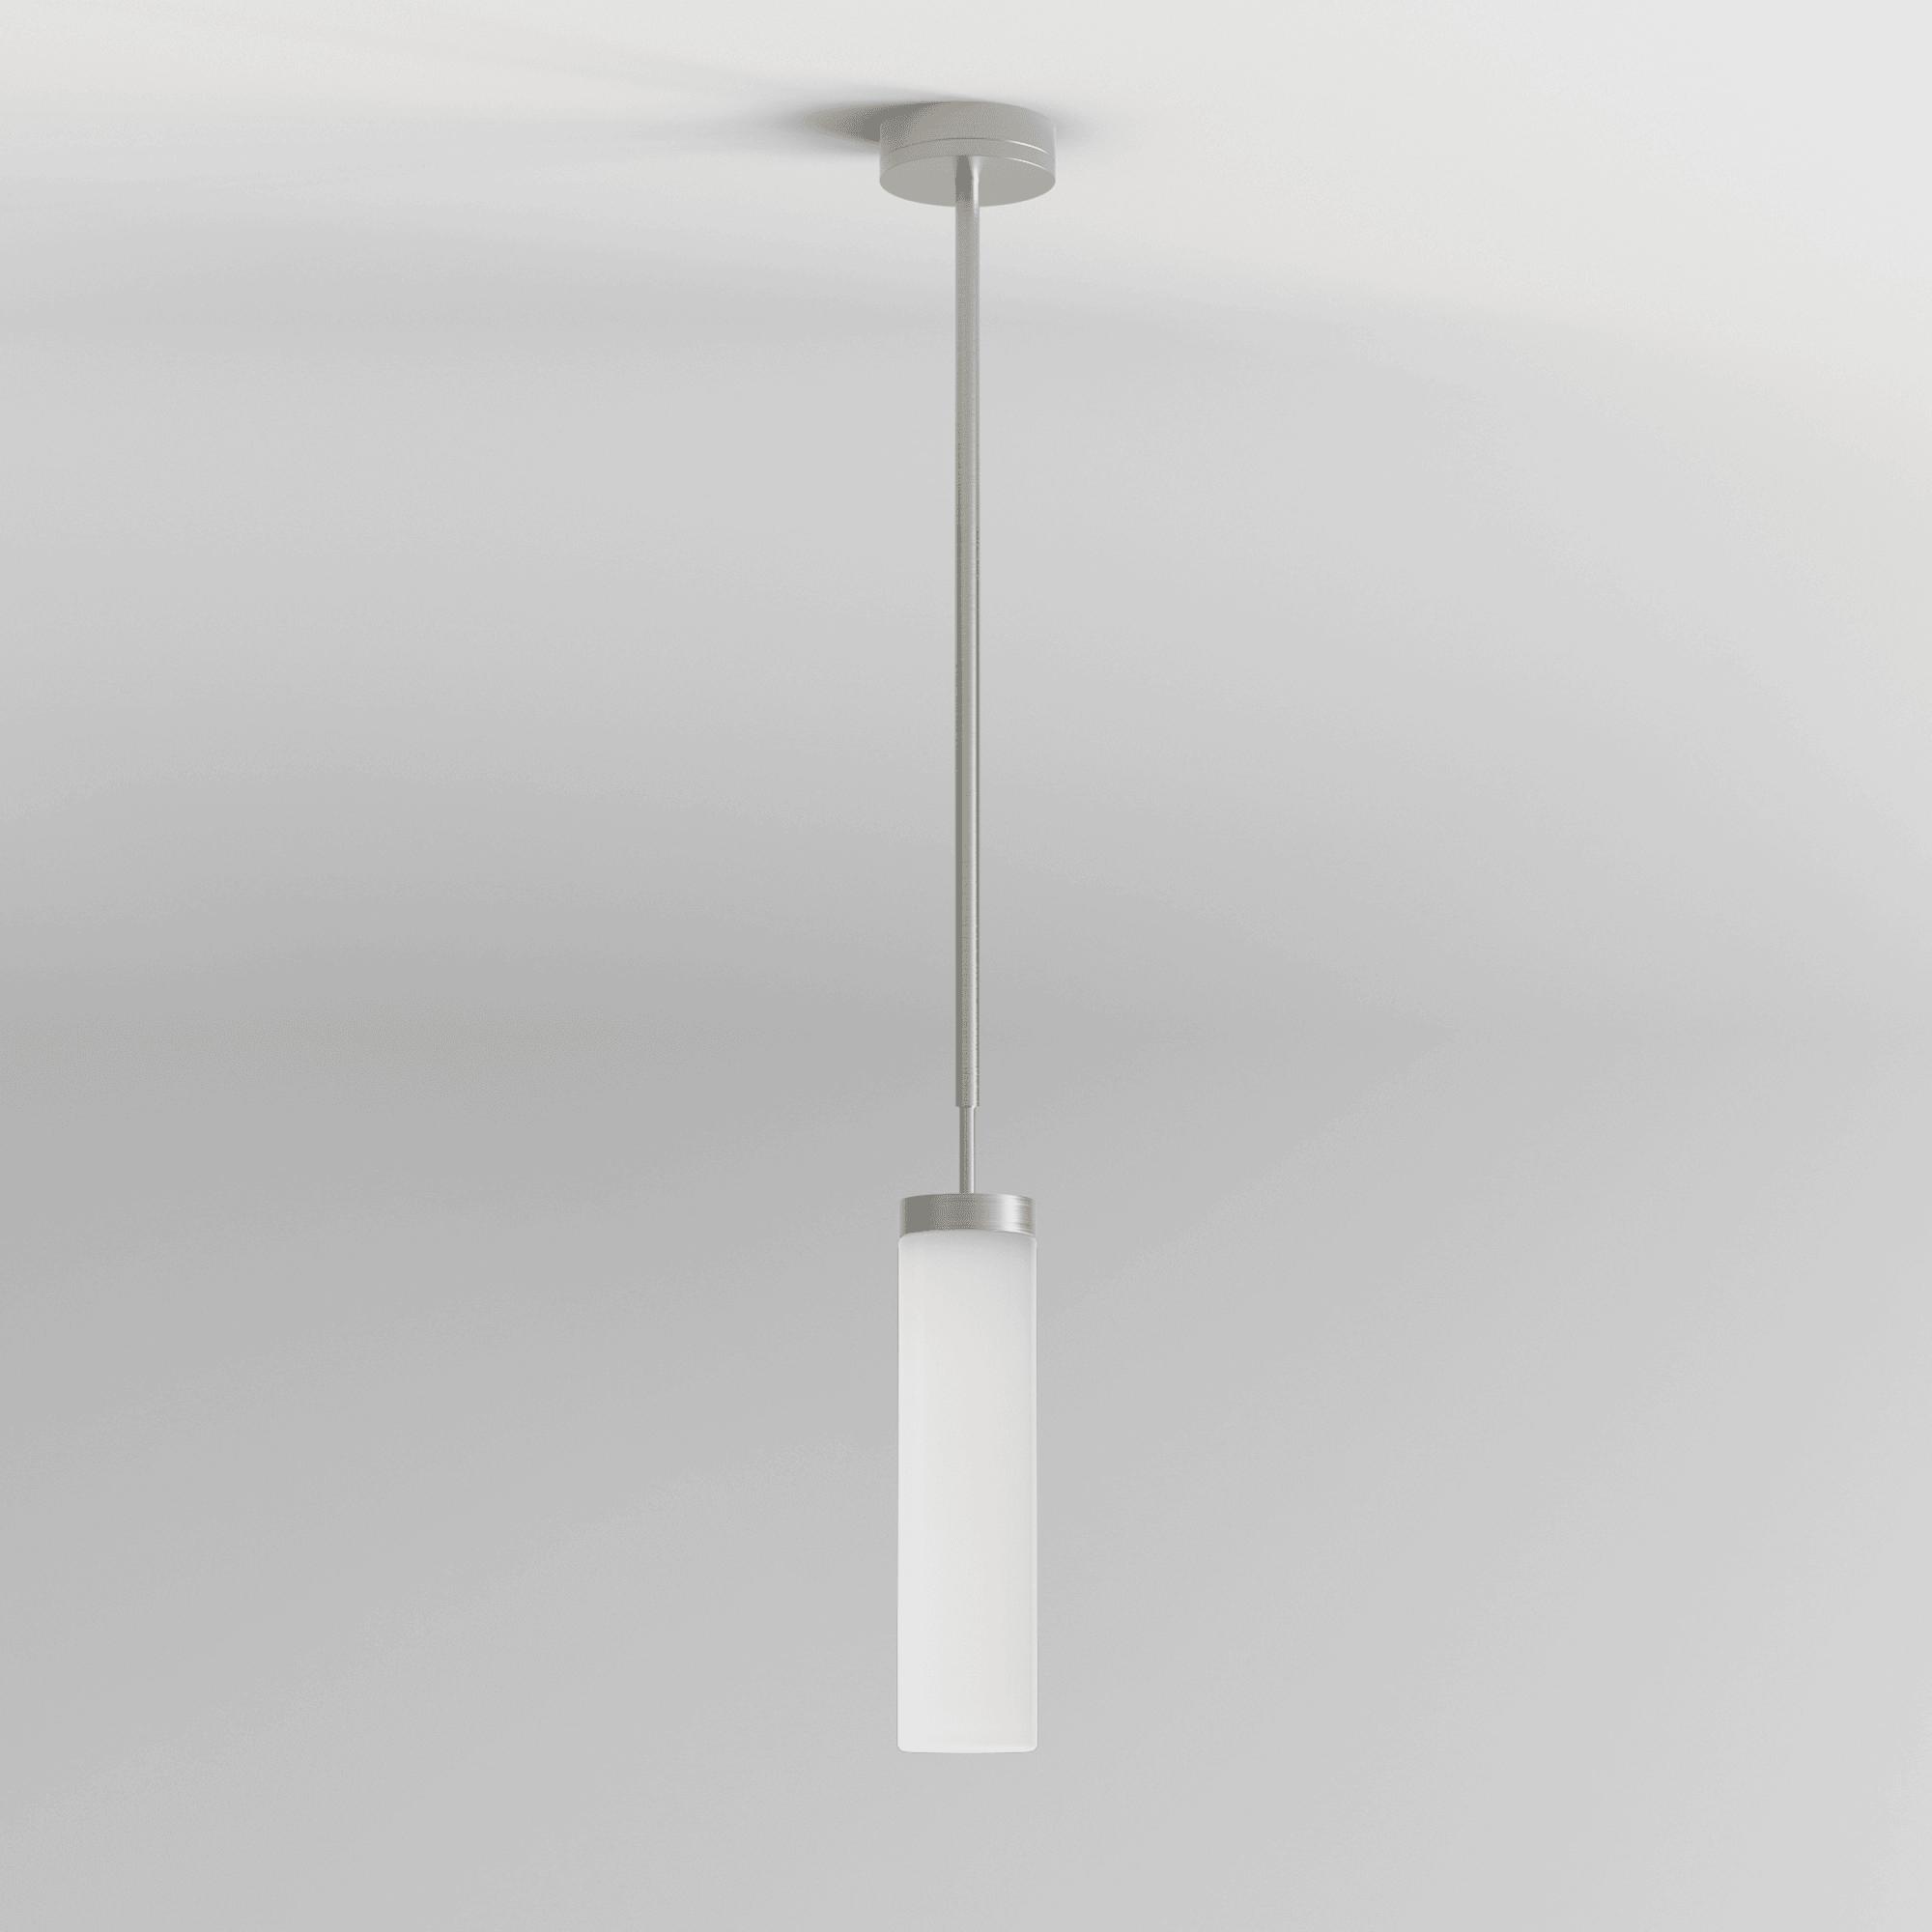 Astro 1060008 8559 Kyoto Ip44 Led Bathroom Pendant Light Matt Nickel